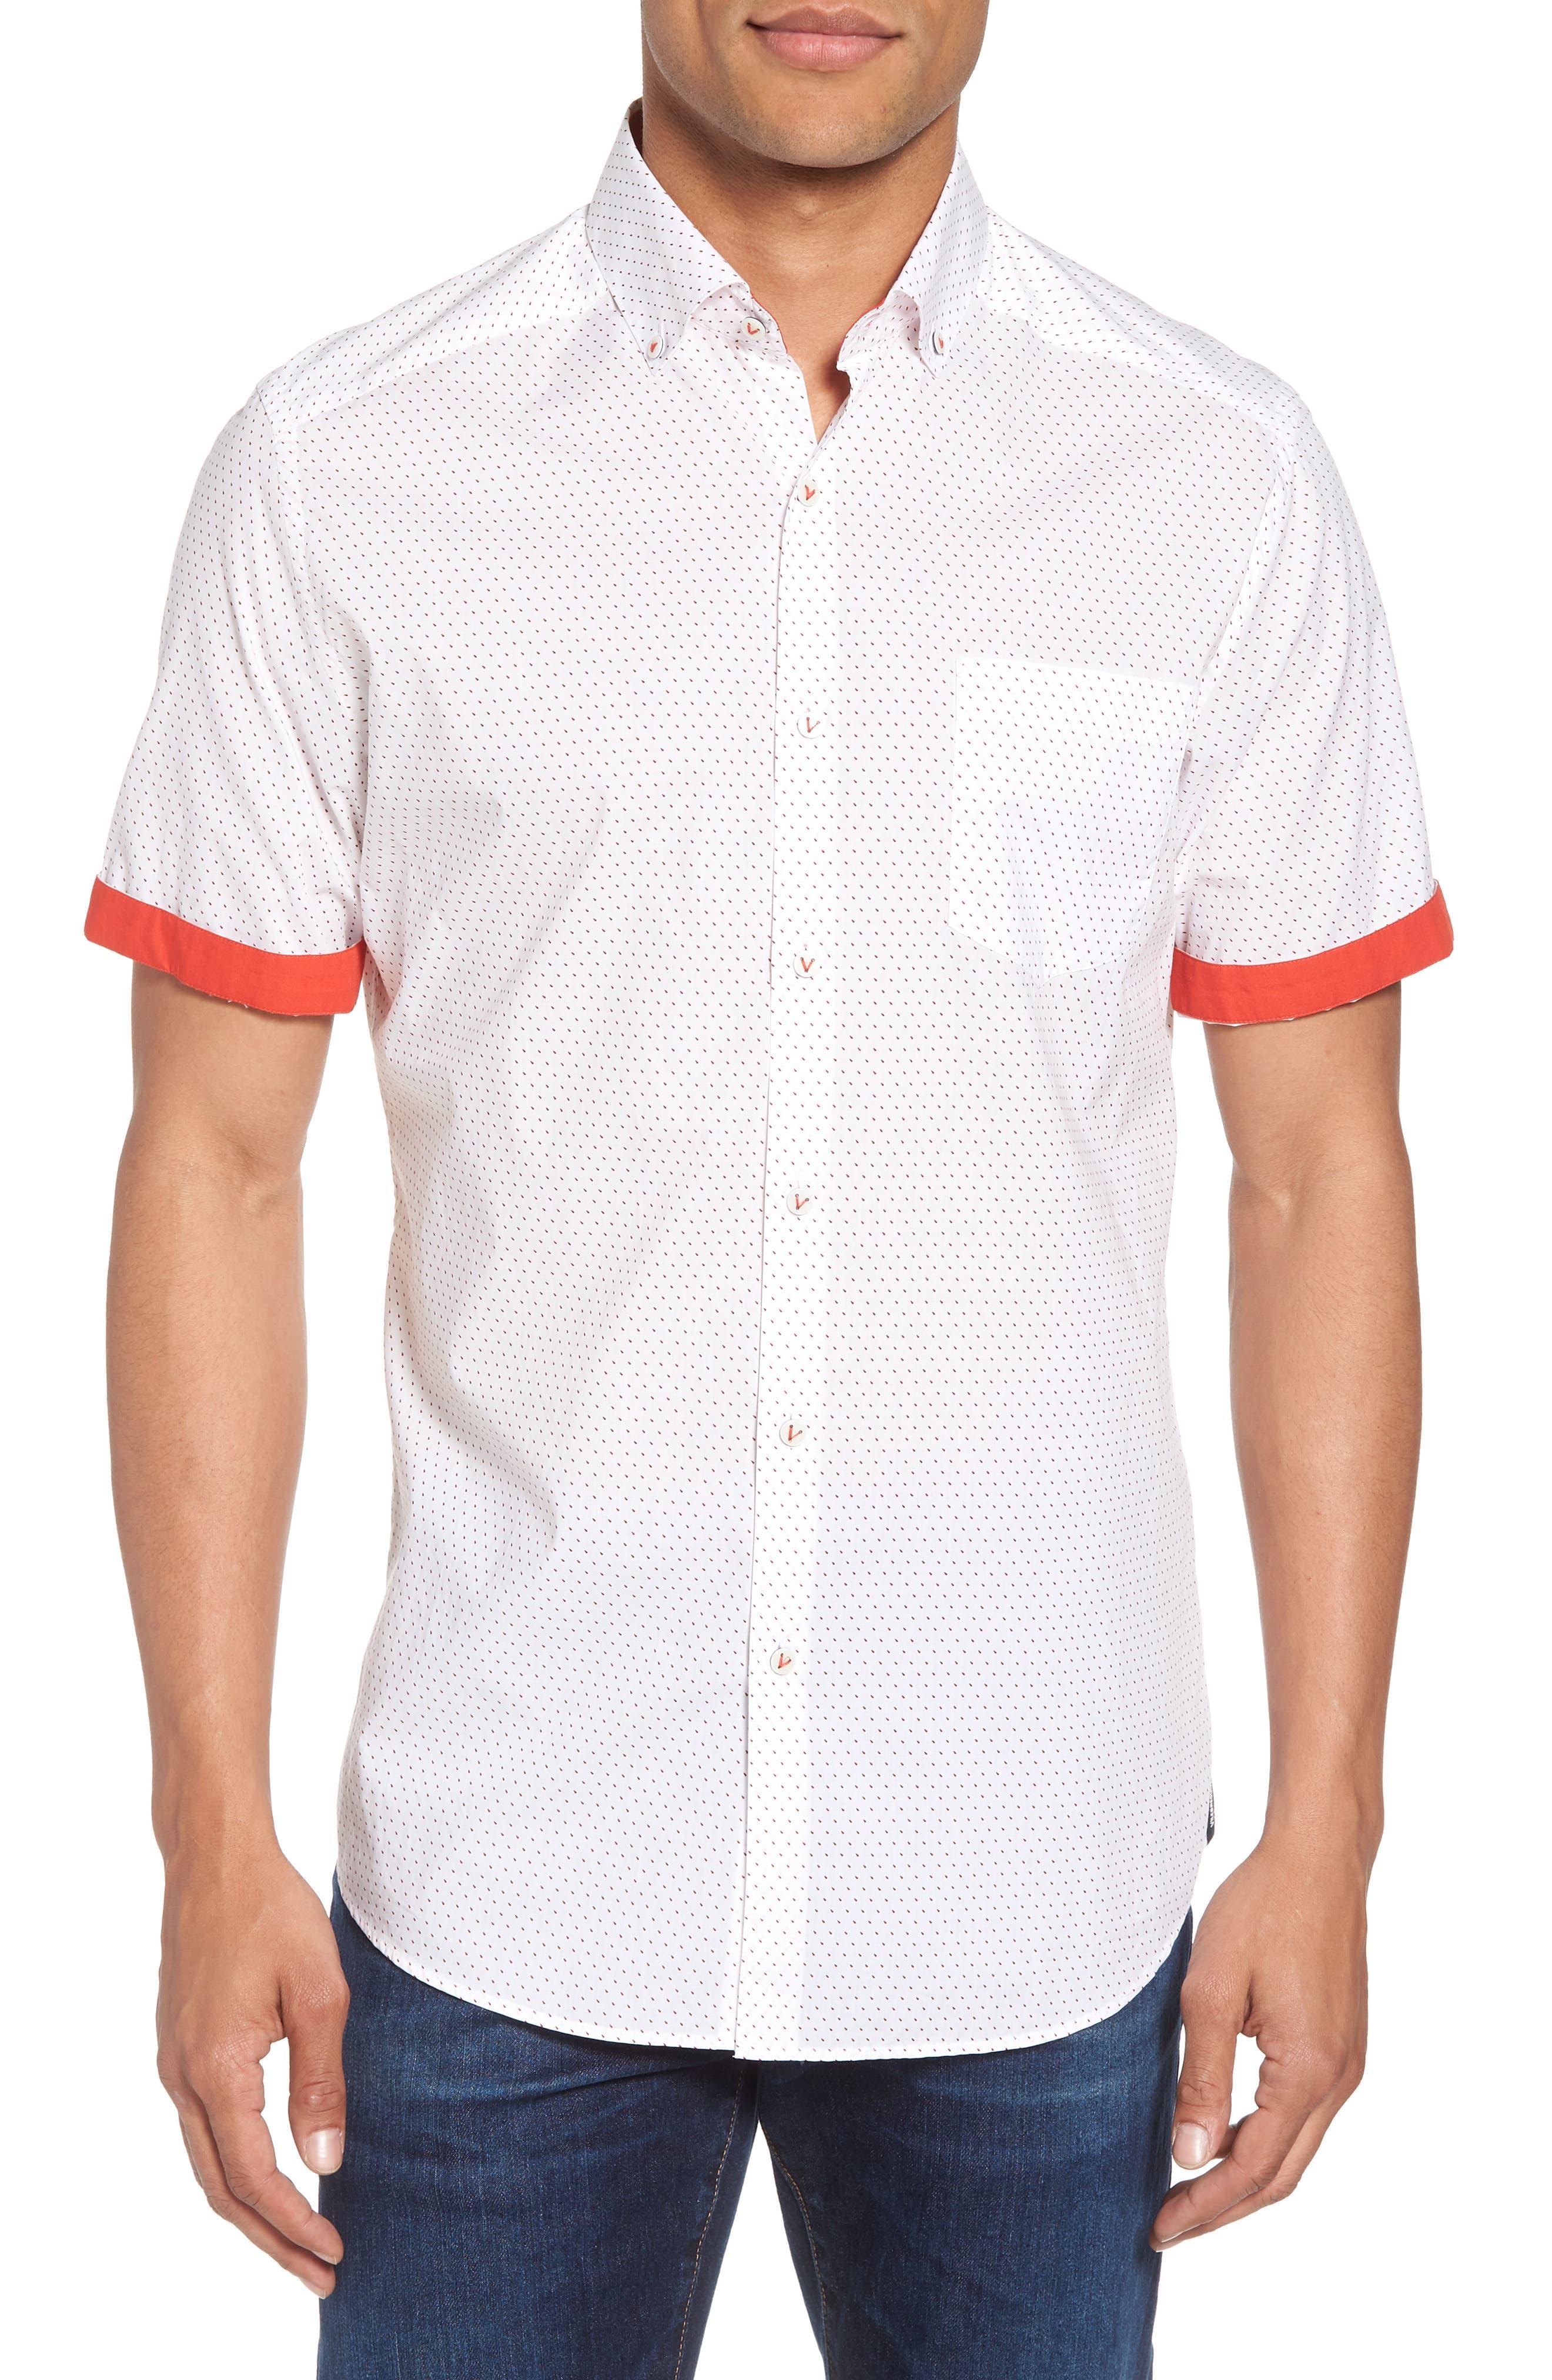 Dot Print Shirt,                         Main,                         color, Canvas / Red Coral